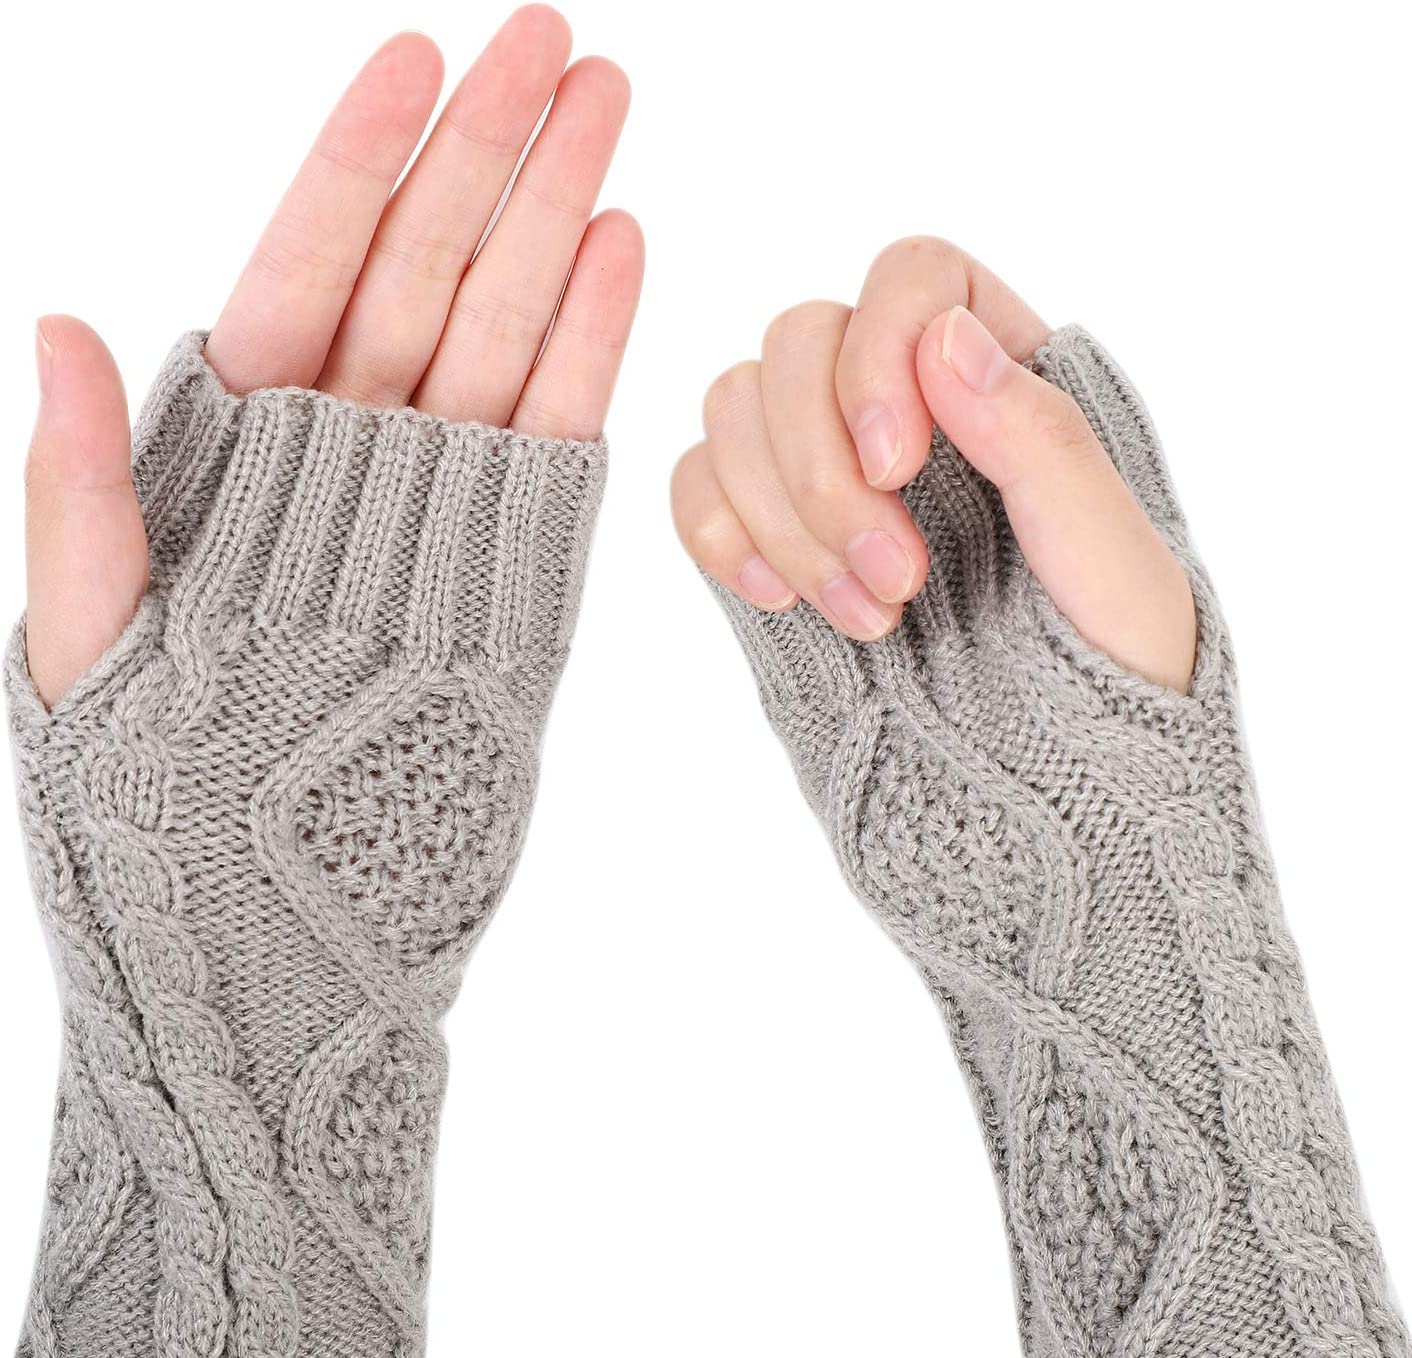 Handw/ärmer Fingerlose Gestrickt Armw/ärmer Halbfinger Winterhandschuhe Handgelenk Arm Pulsw/ärmer F/äustlinge Handgelenkw/ärmer Rhombus Muster Armstulpen Strickhandschuhe f/ür Damen M/ädchen